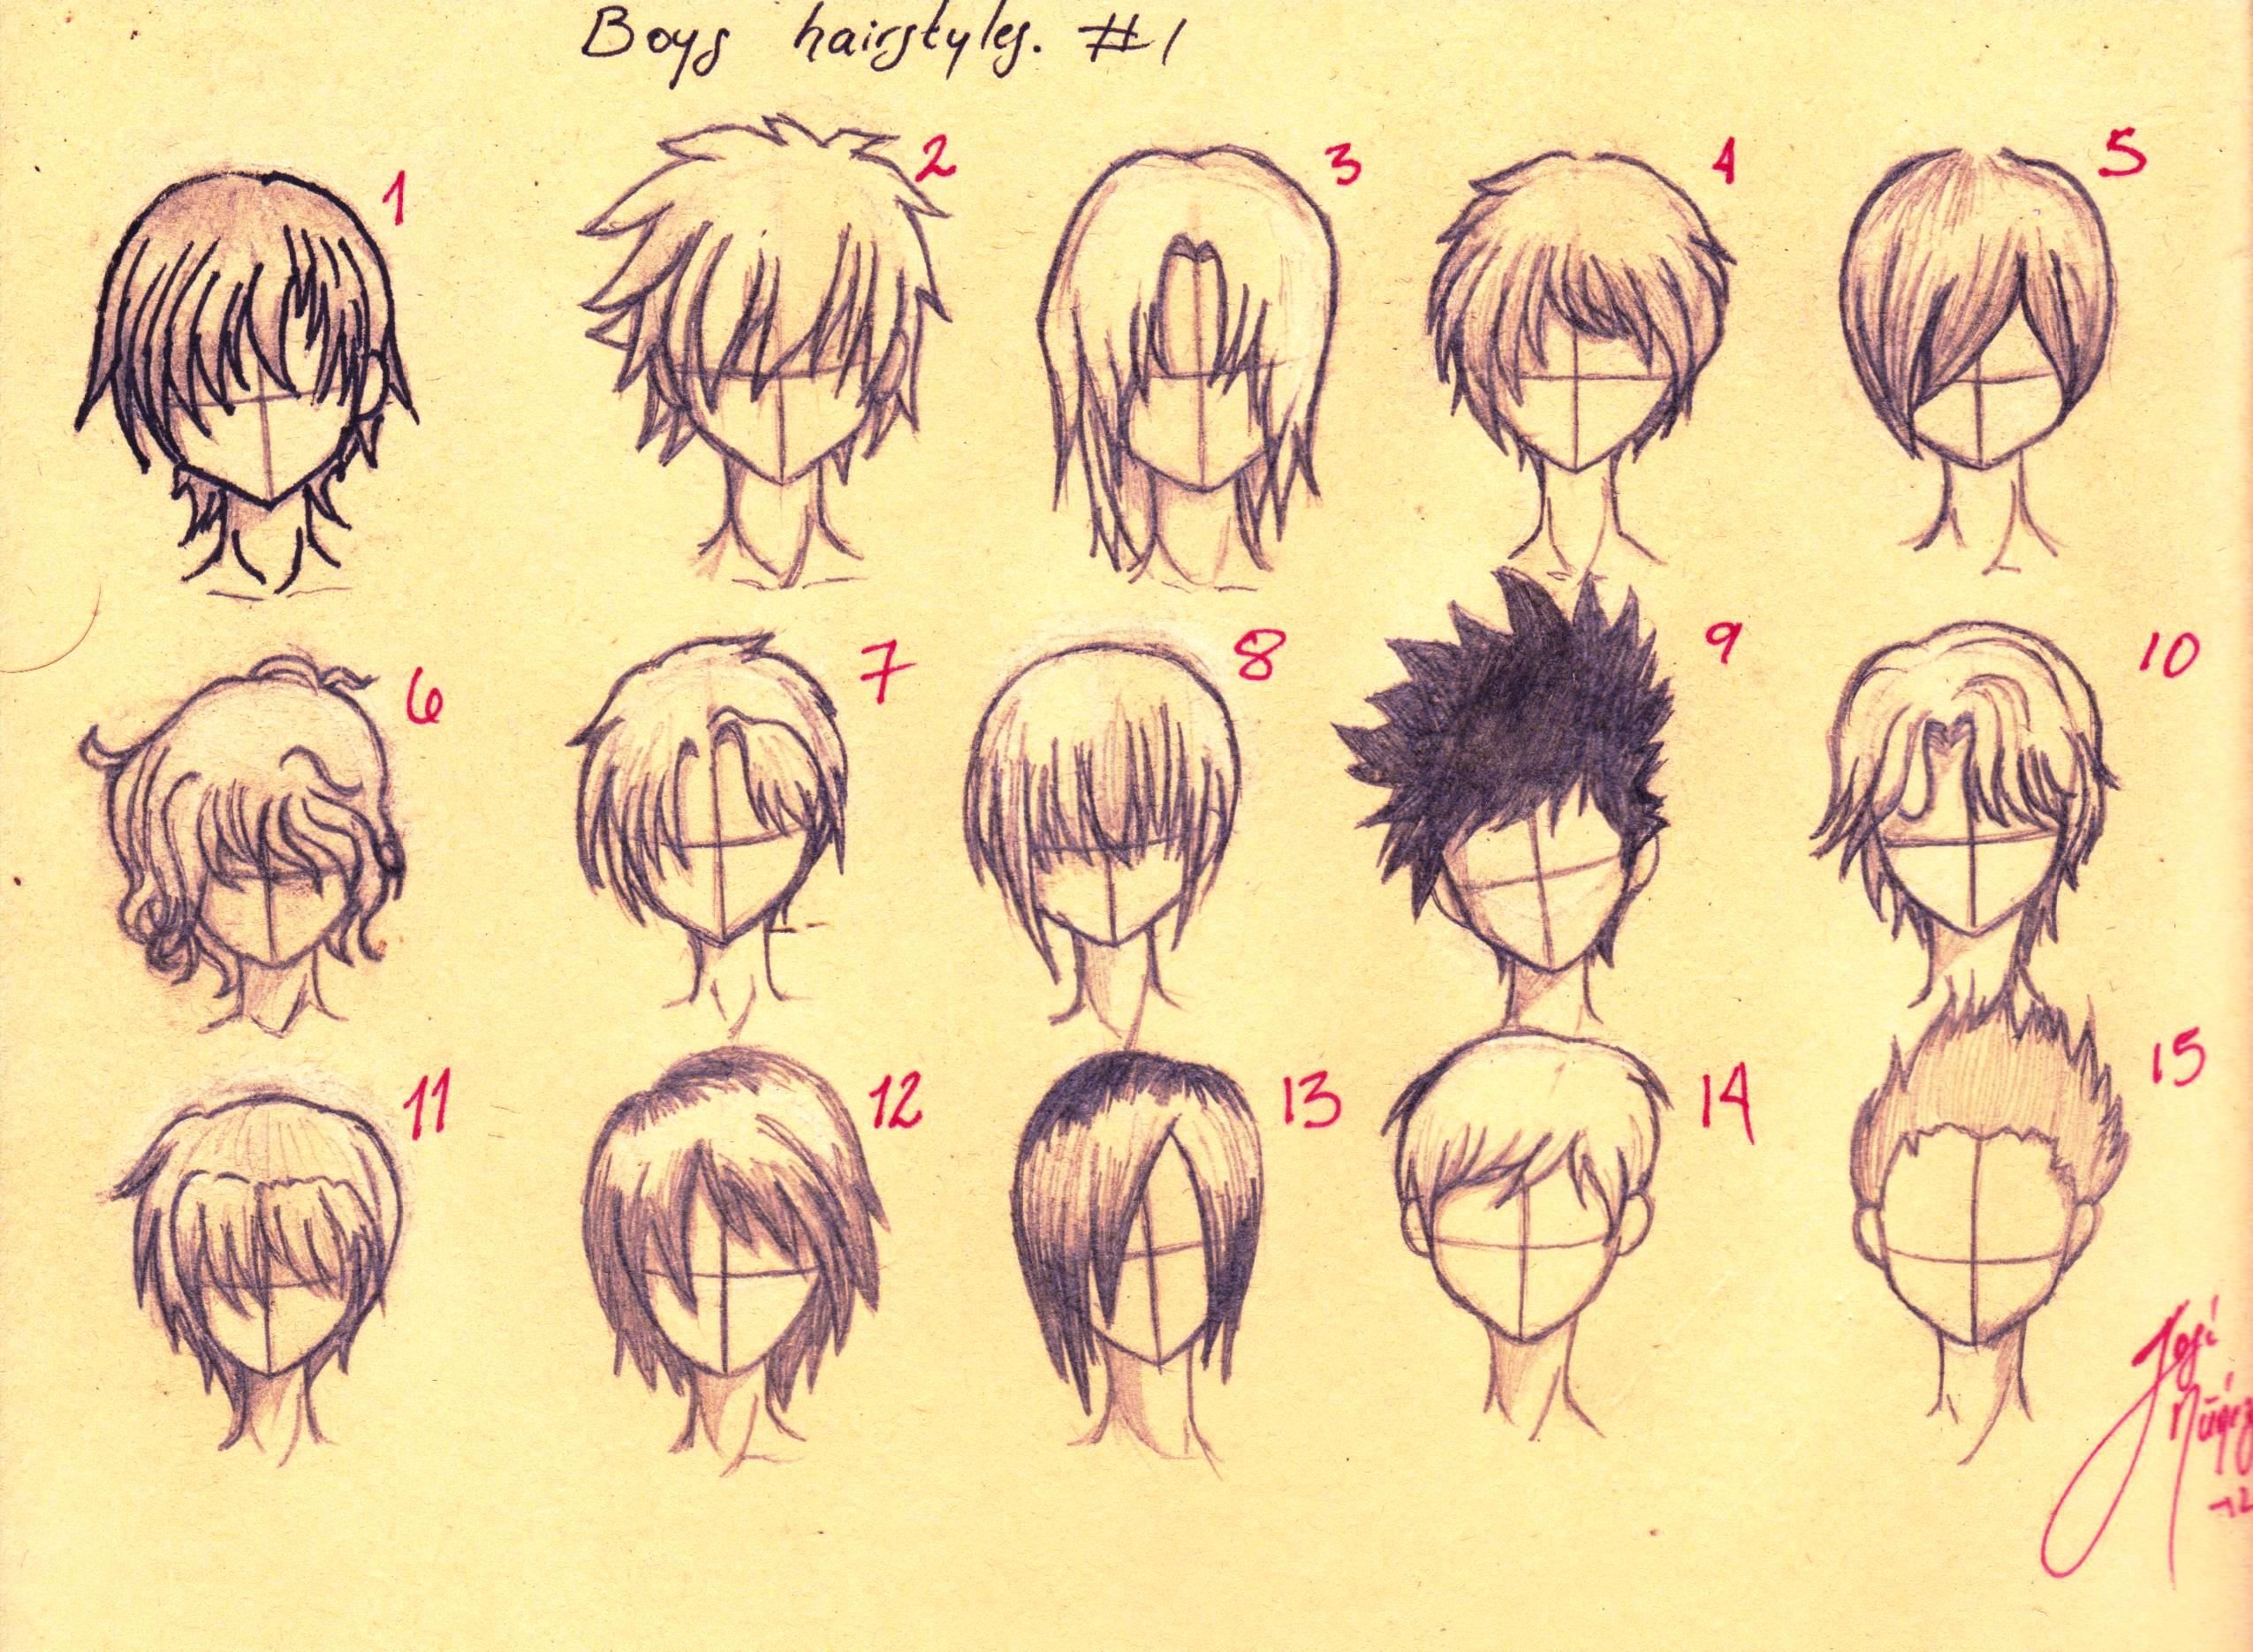 boys hairstyles Anime boys Hairstyles all fifteen